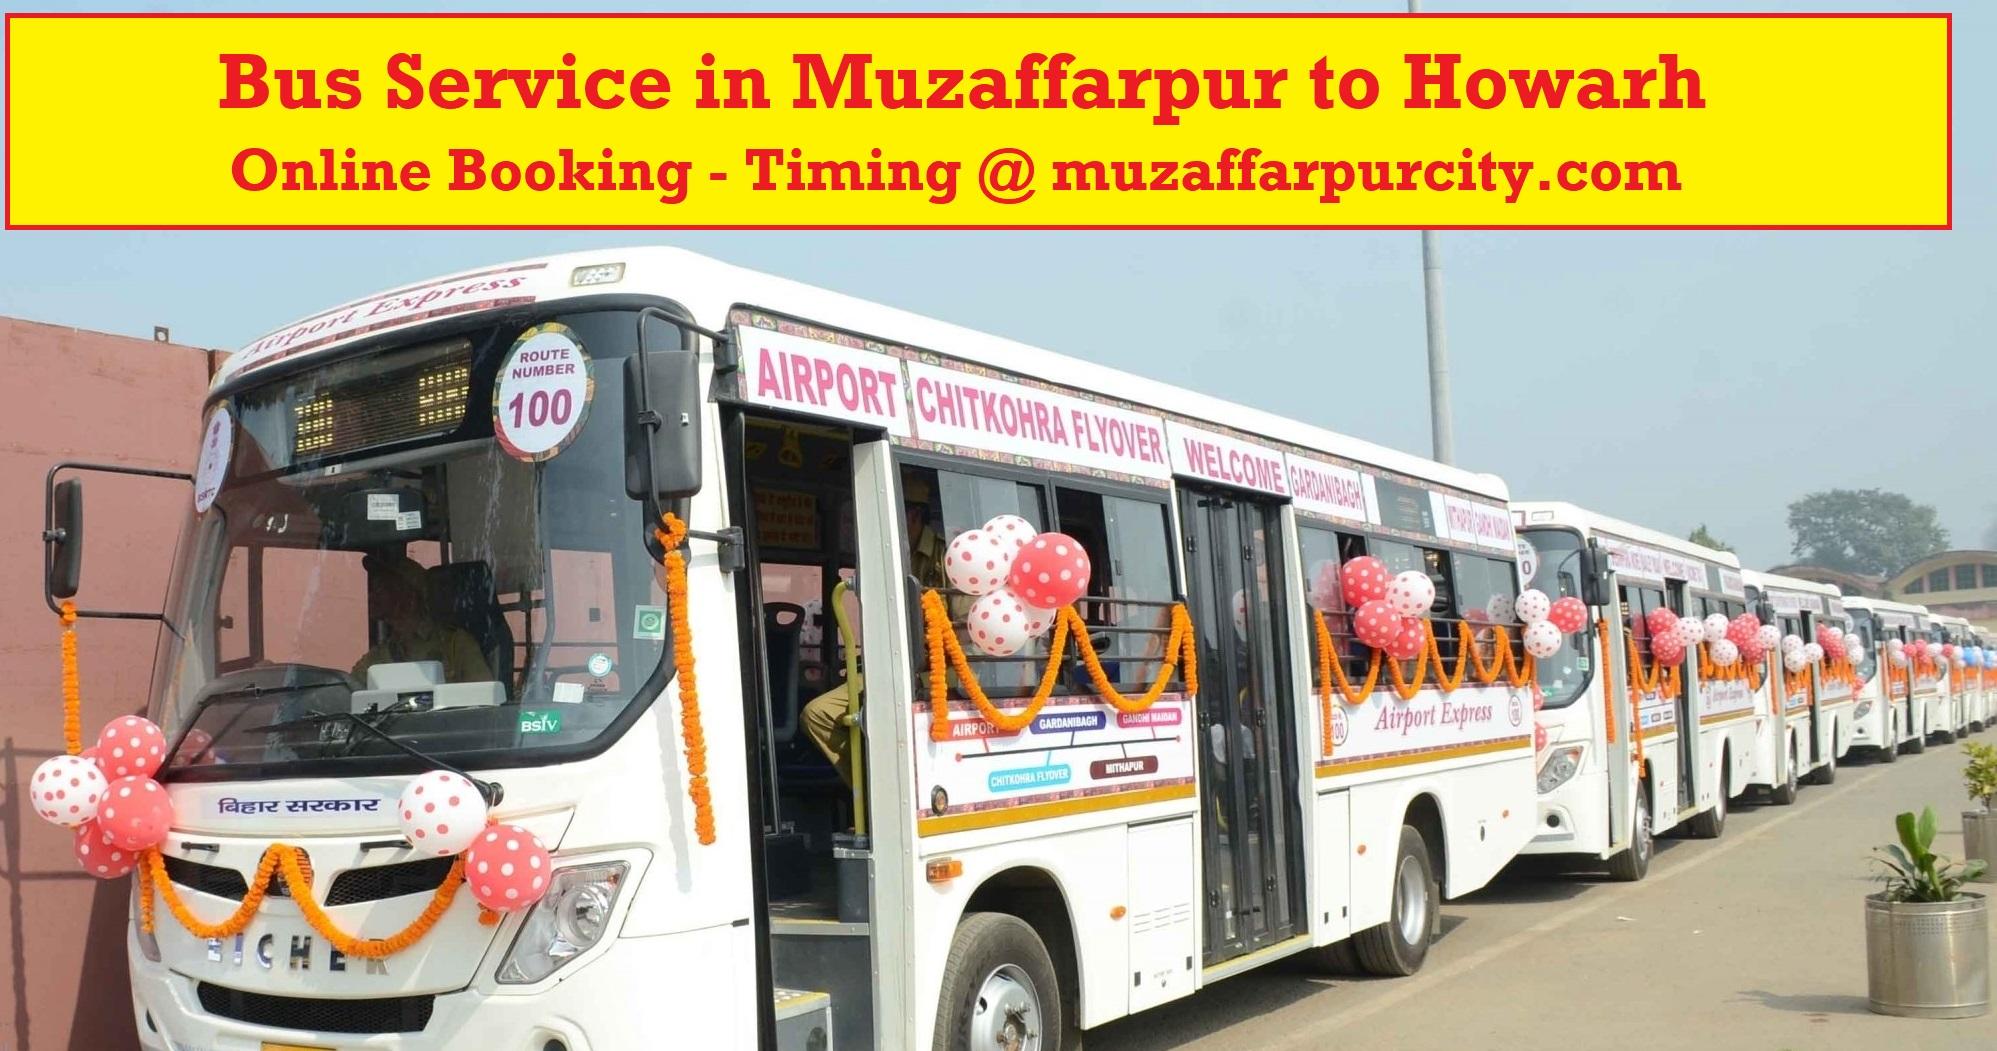 Bus Service in Muzaffarpur to Howarh